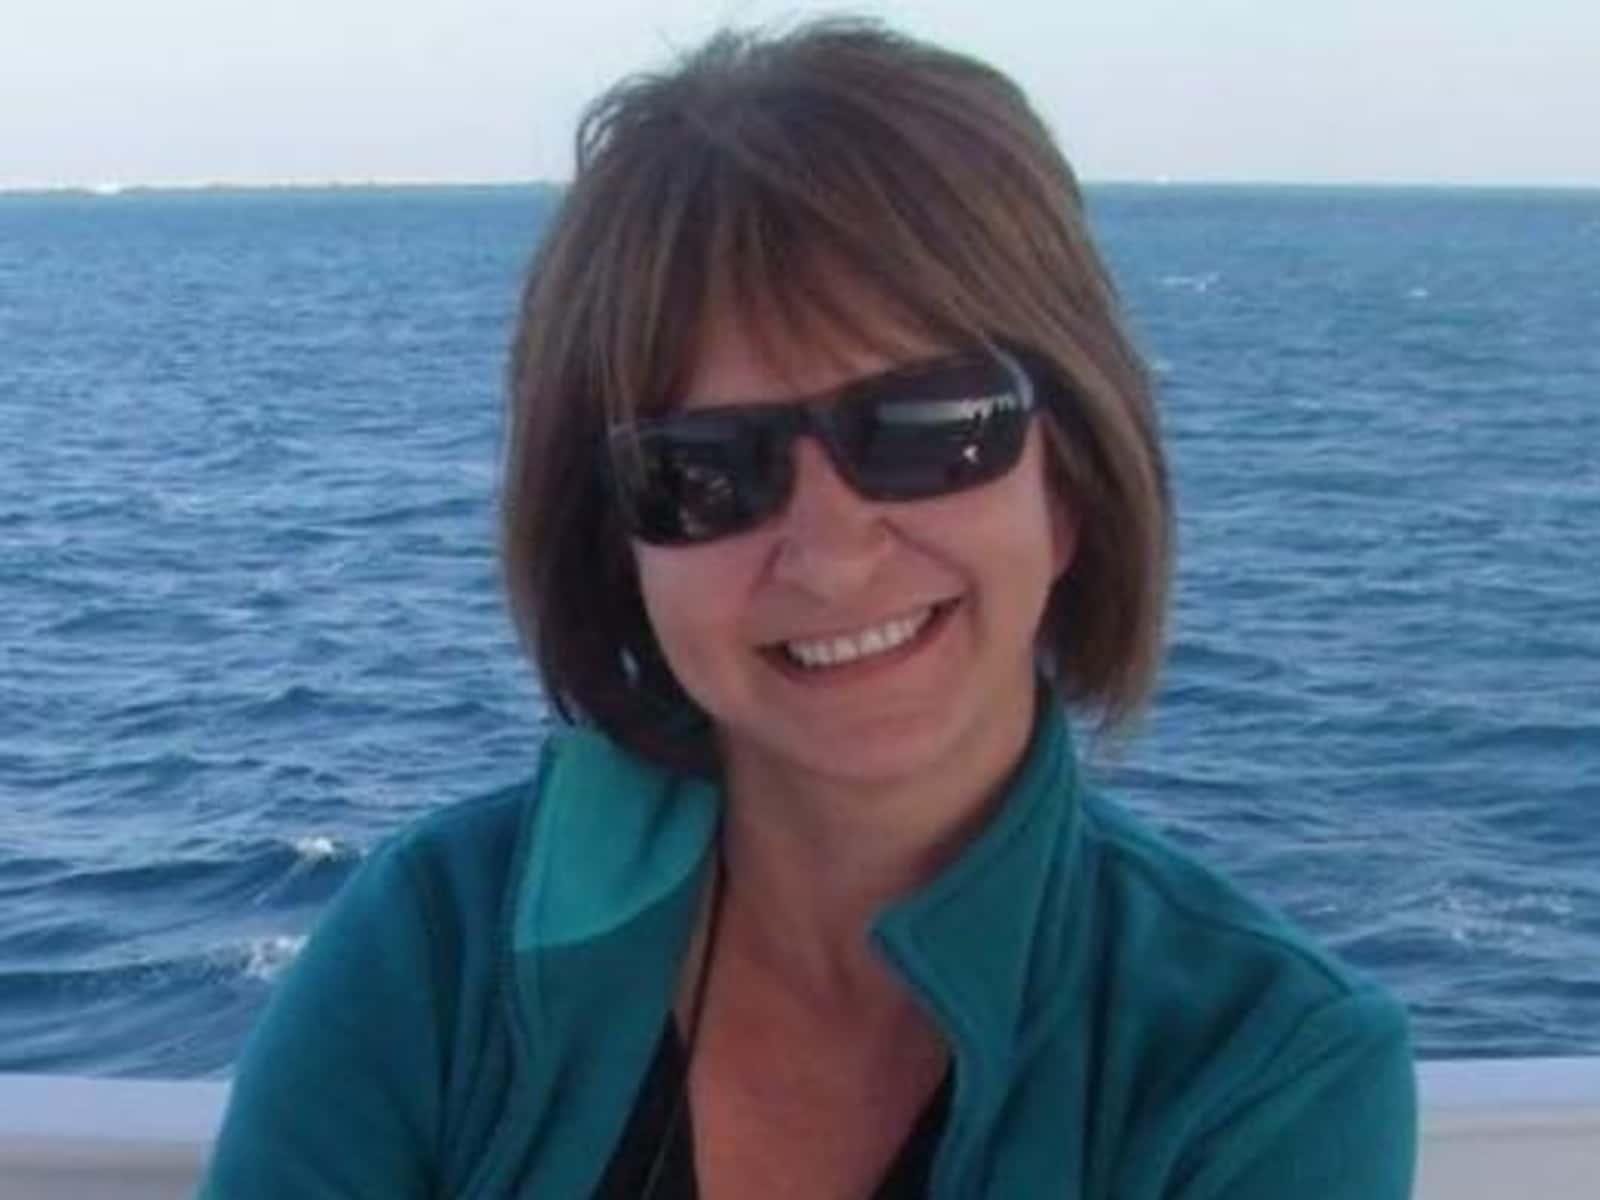 Elaine from Aberdeen, United Kingdom